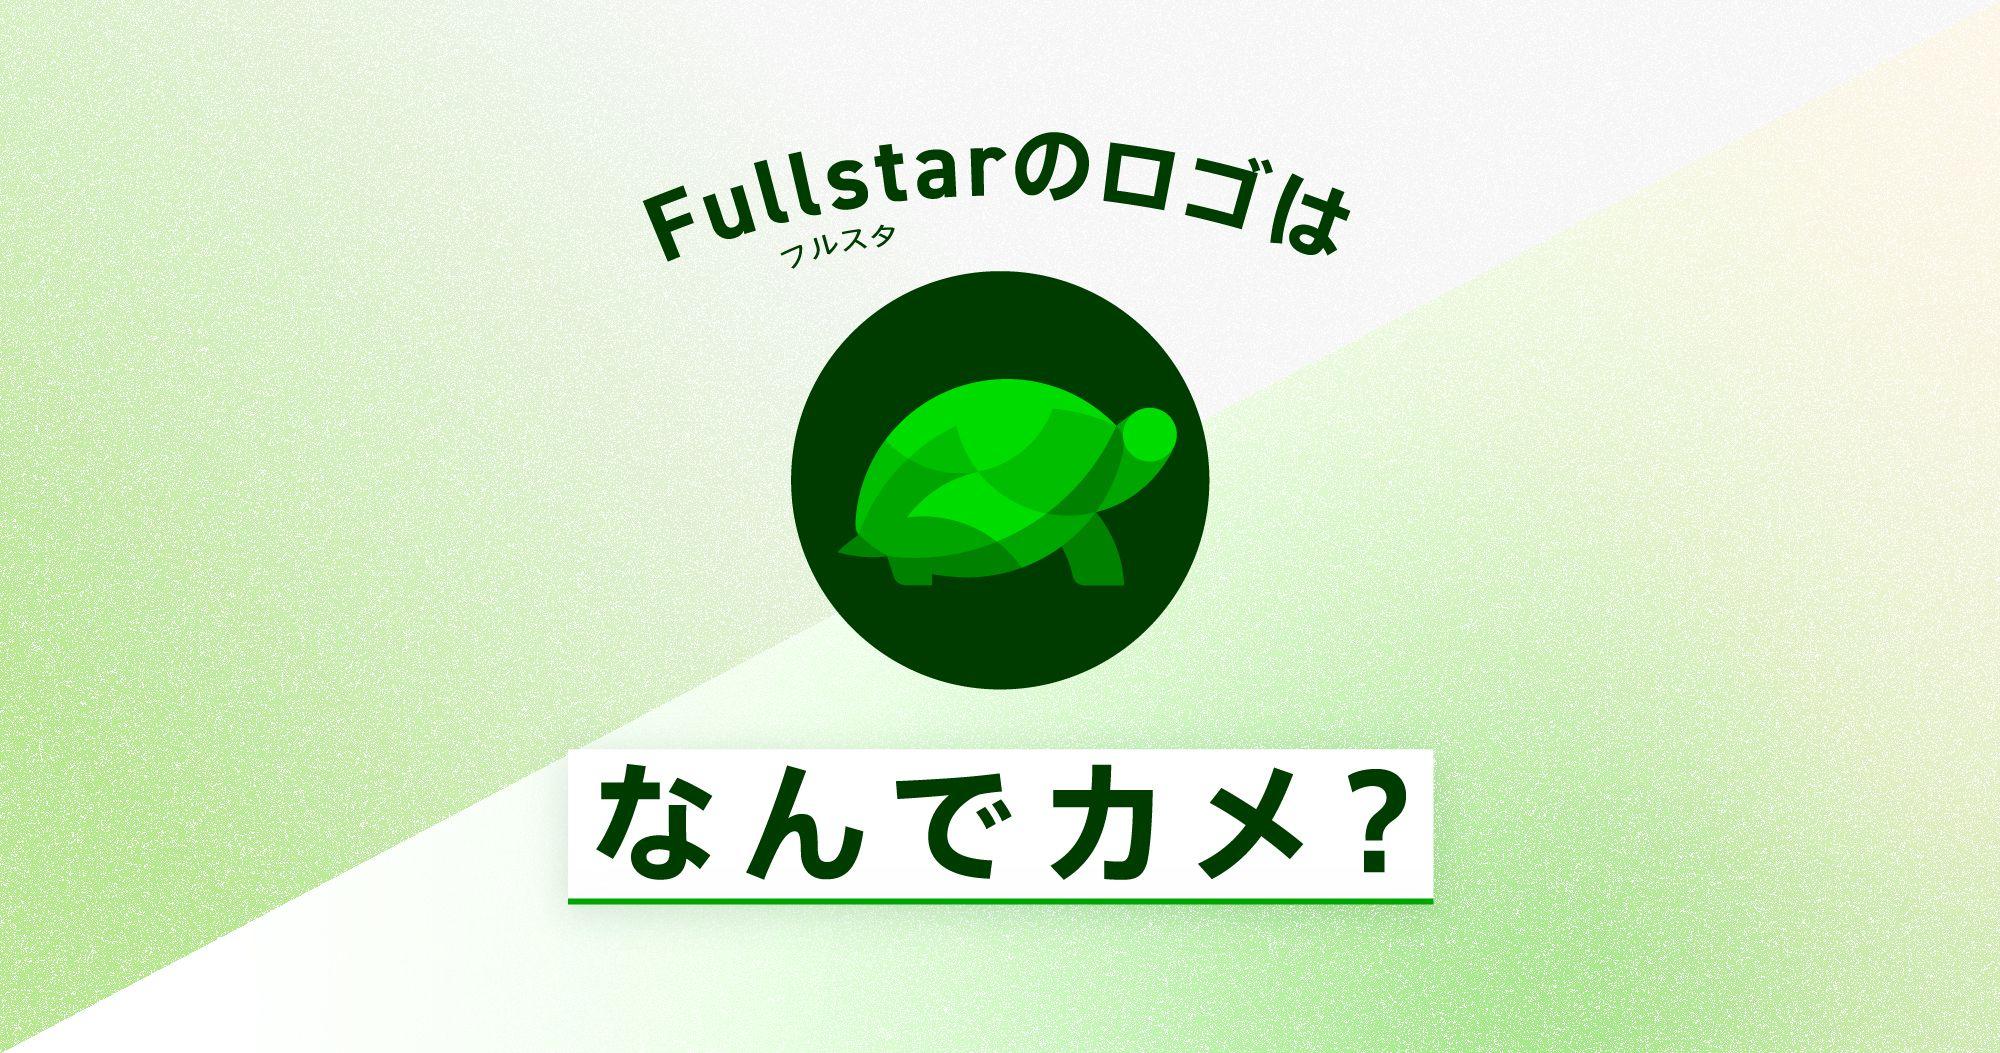 Fullstar(フルスタ)のロゴはなぜカメなのか?由来のご紹介